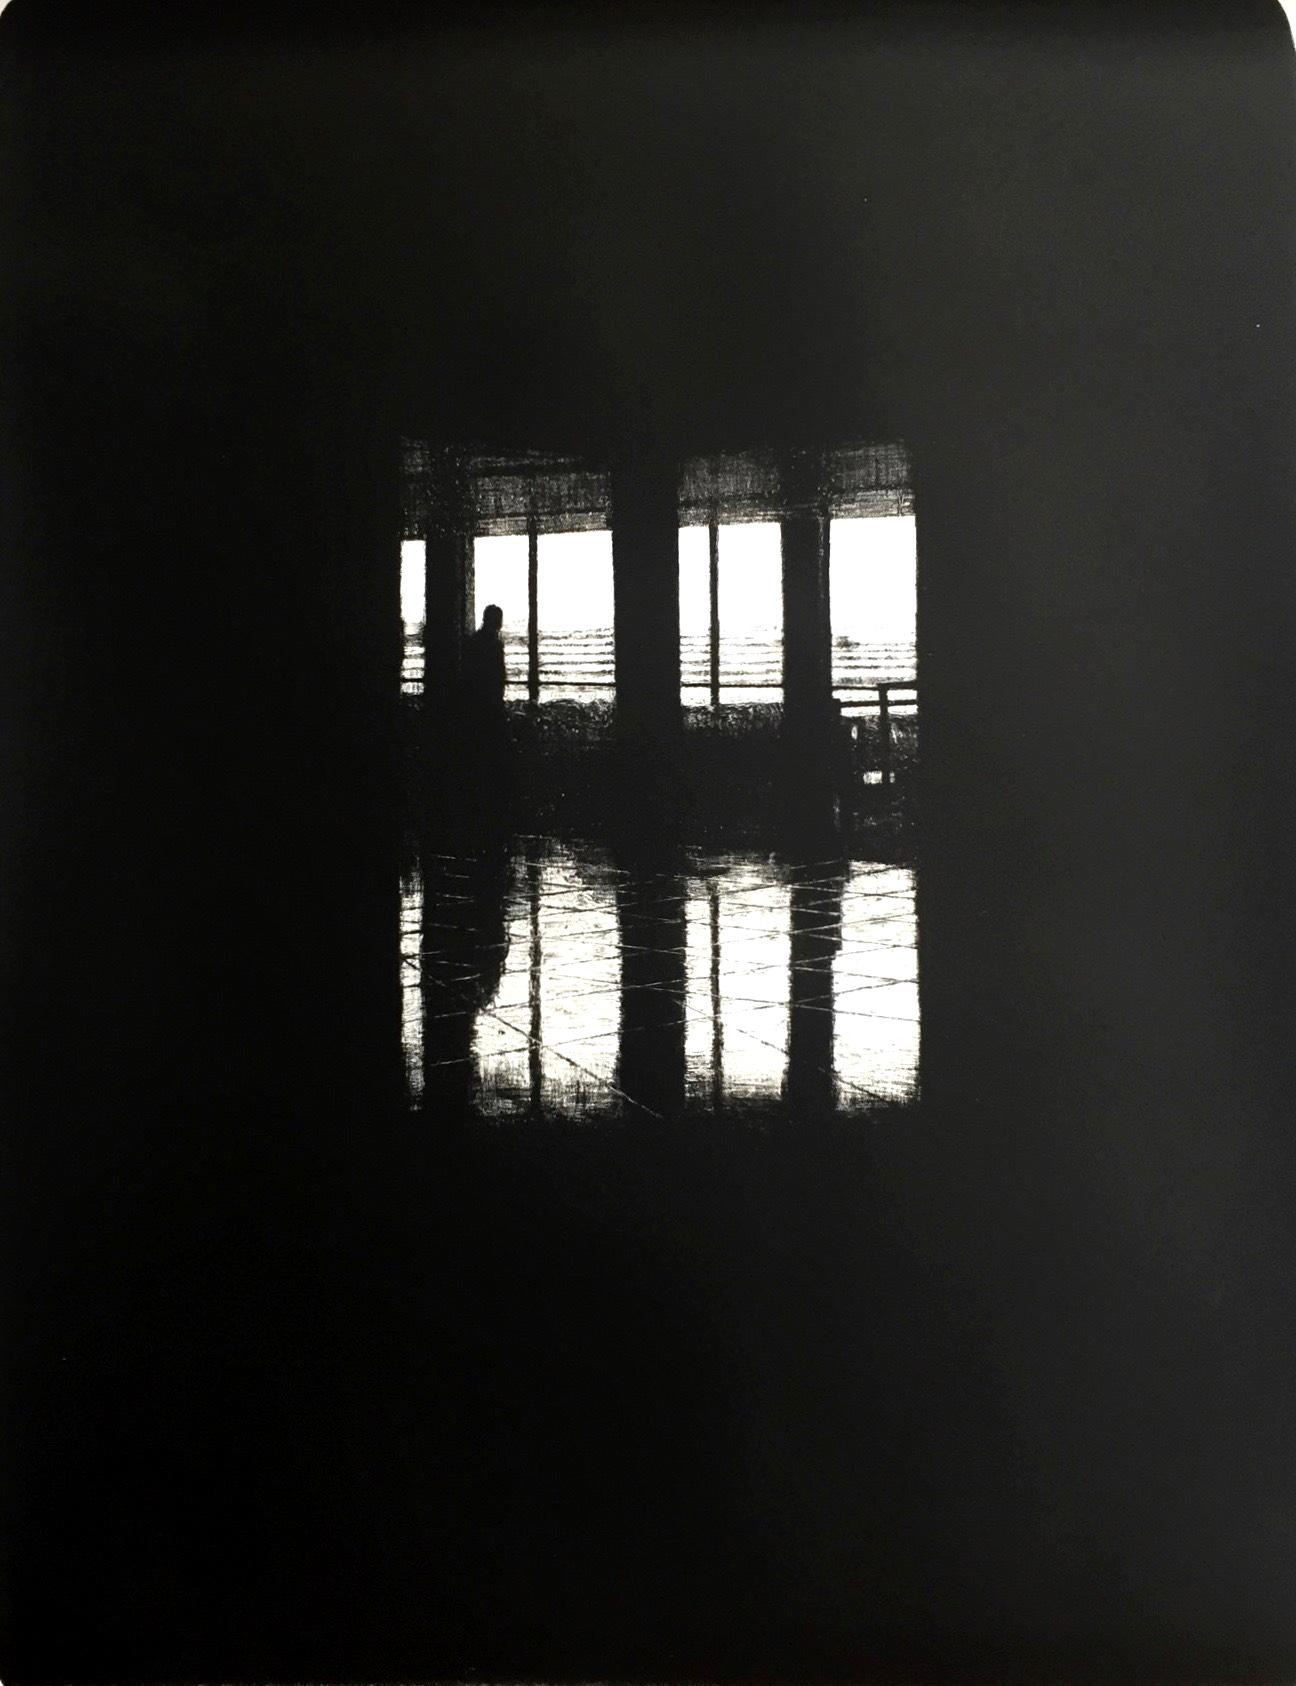 Departures II (JFK), 2016, lithograph, 55cm x 75cm, Ed. 15